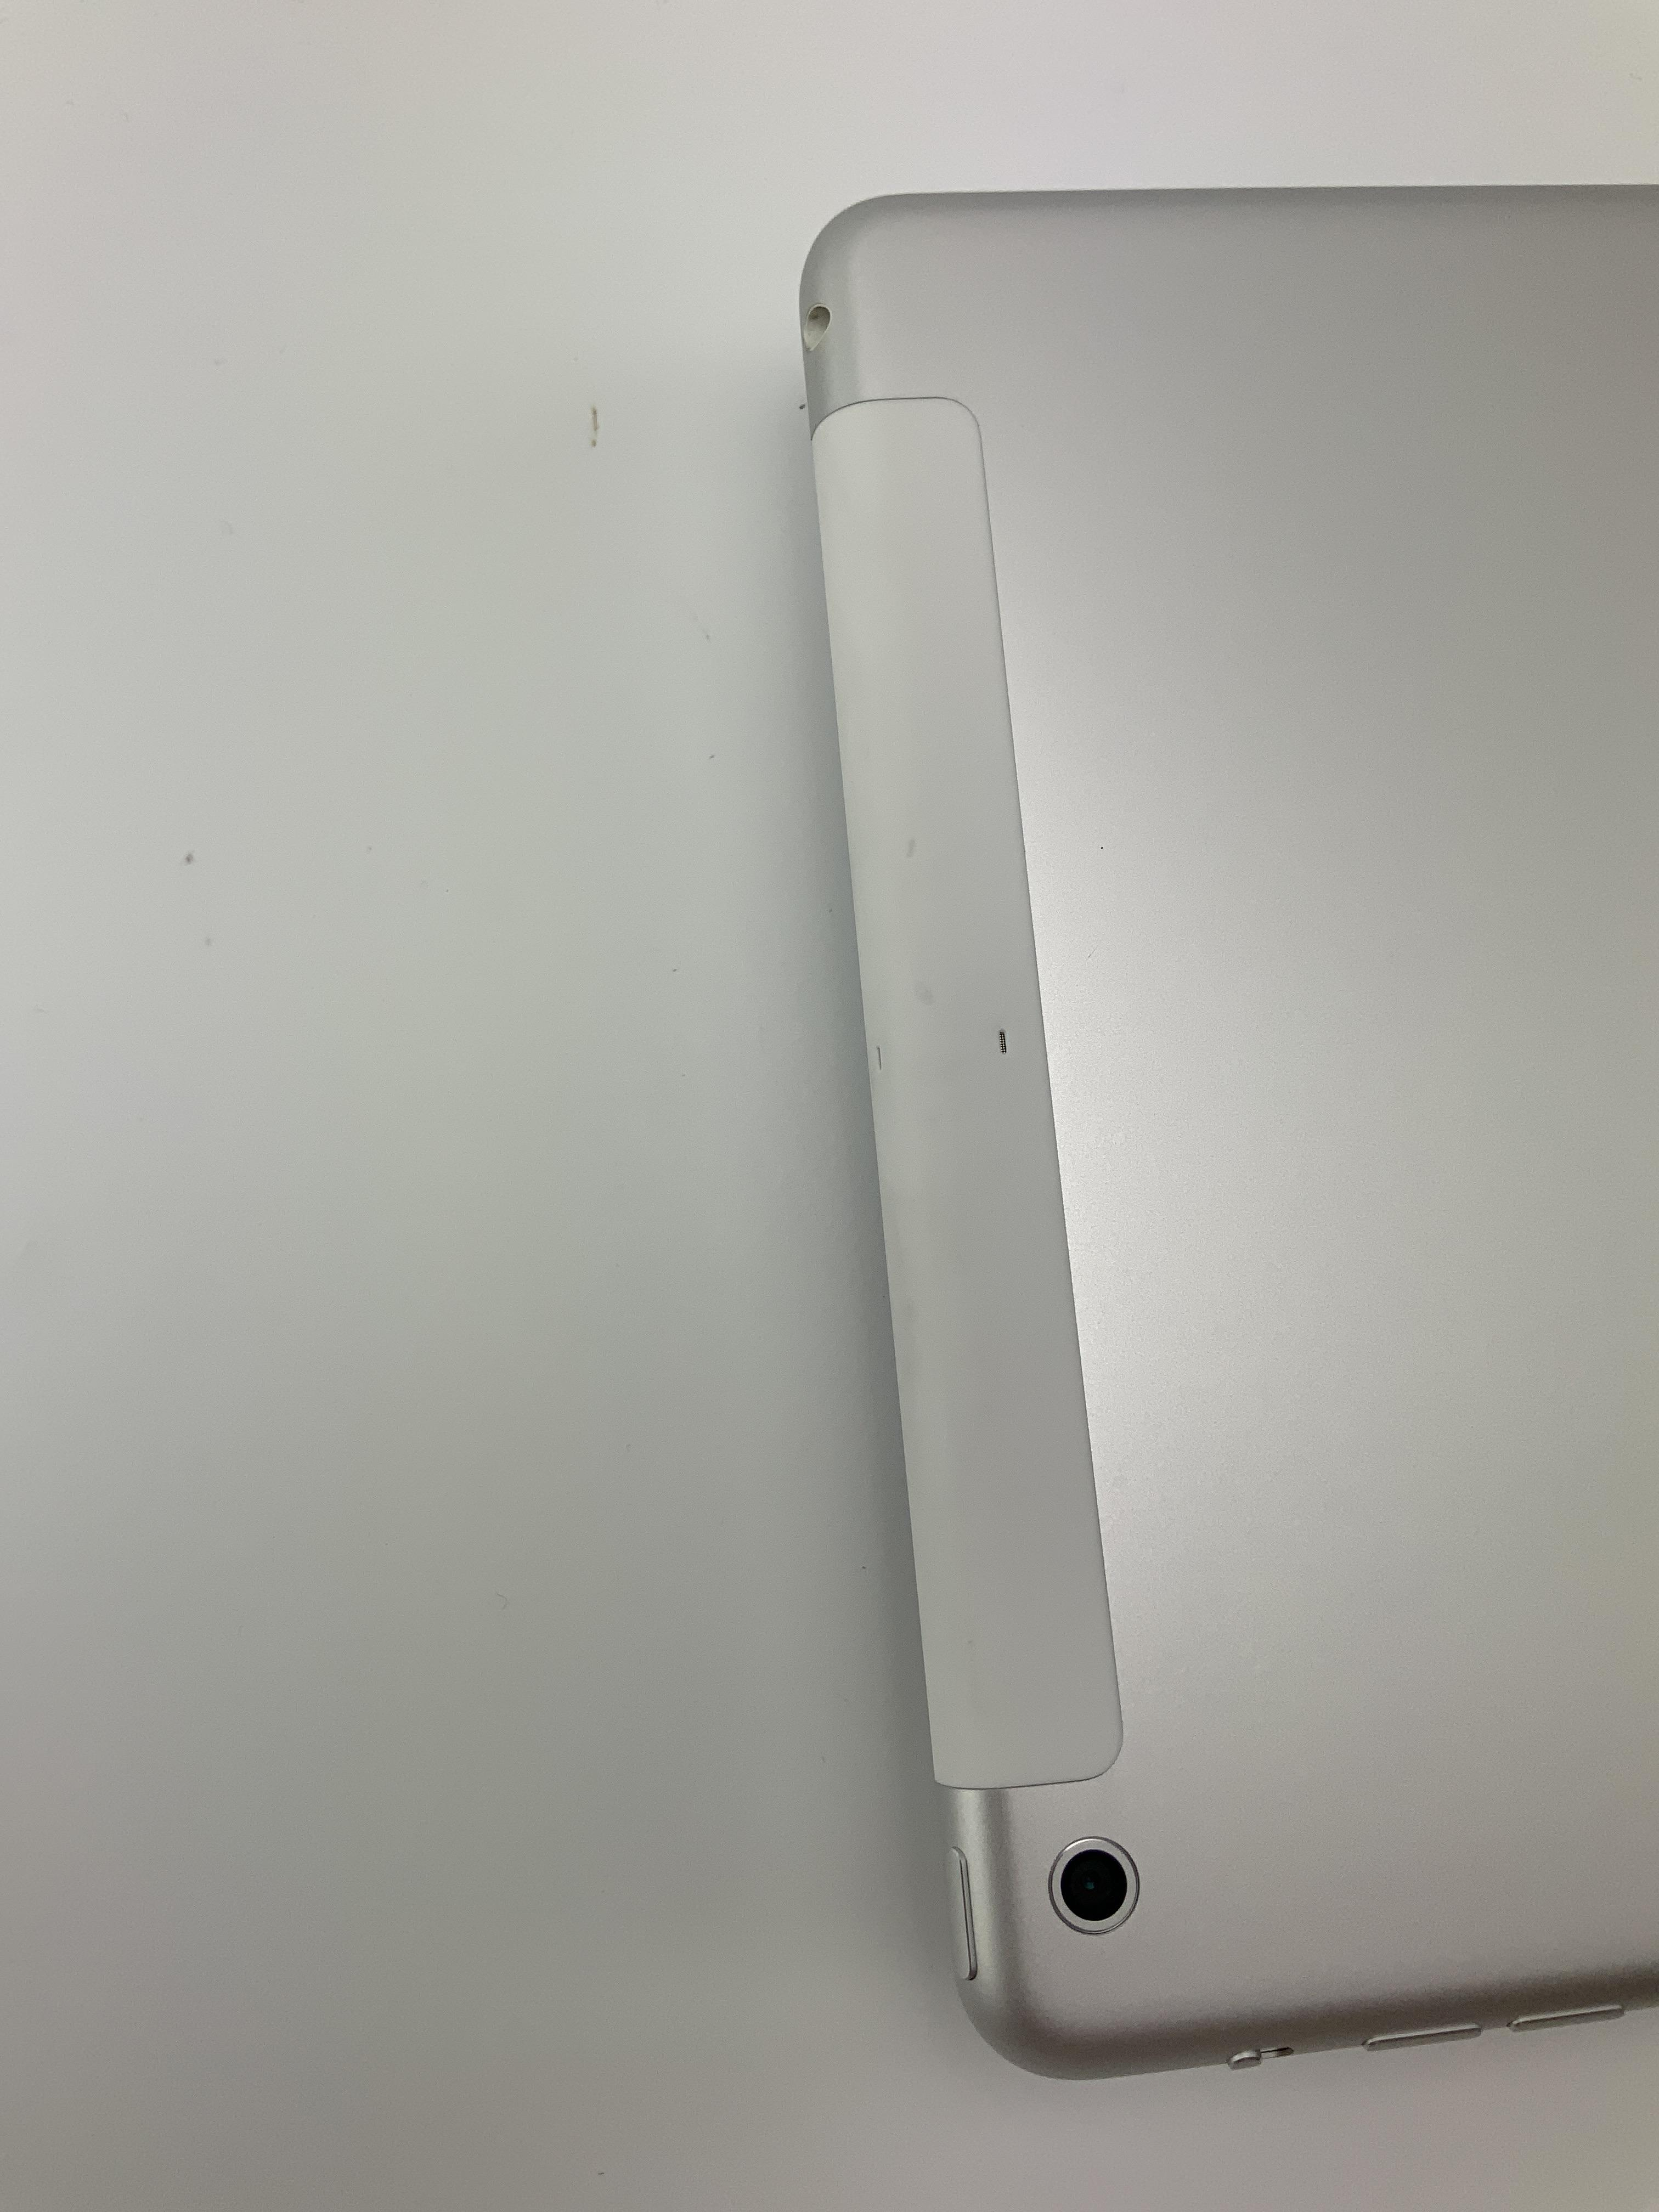 iPad Air 2 Wi-Fi + Cellular 32GB, 32GB, Silver, Afbeelding 4